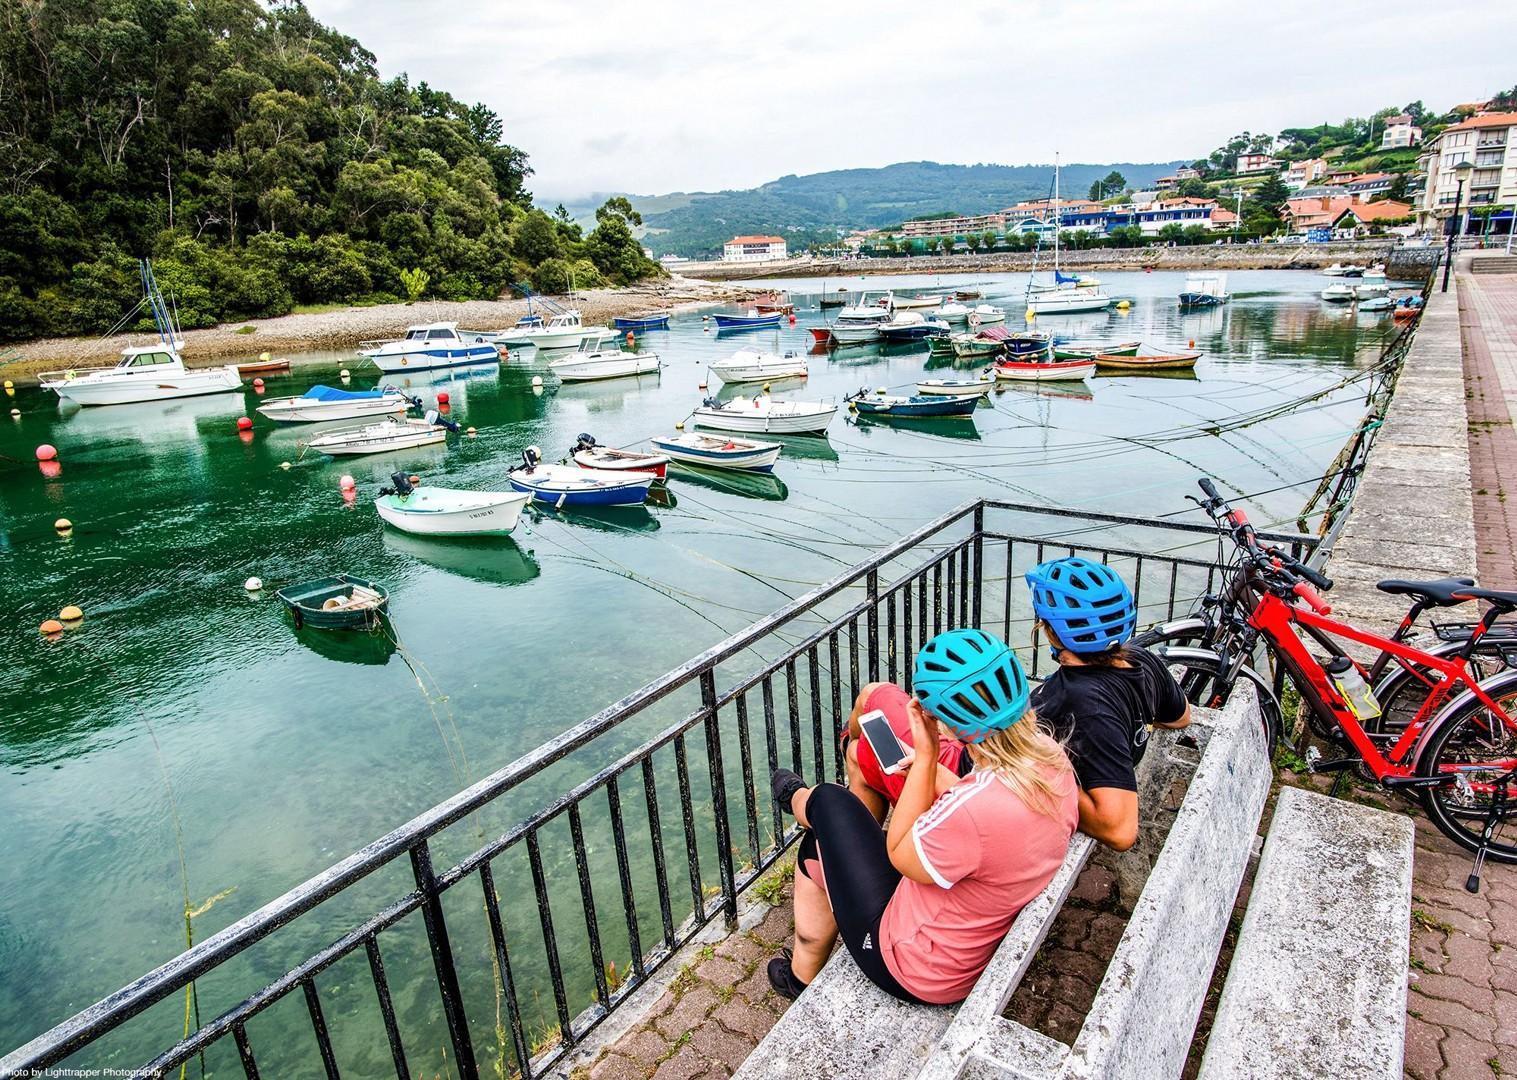 spain-cycling-self-guided-leisure-holiday-bike.jpg - NEW! Spain - Bilbao to San Sebastian - Leisure Cycling